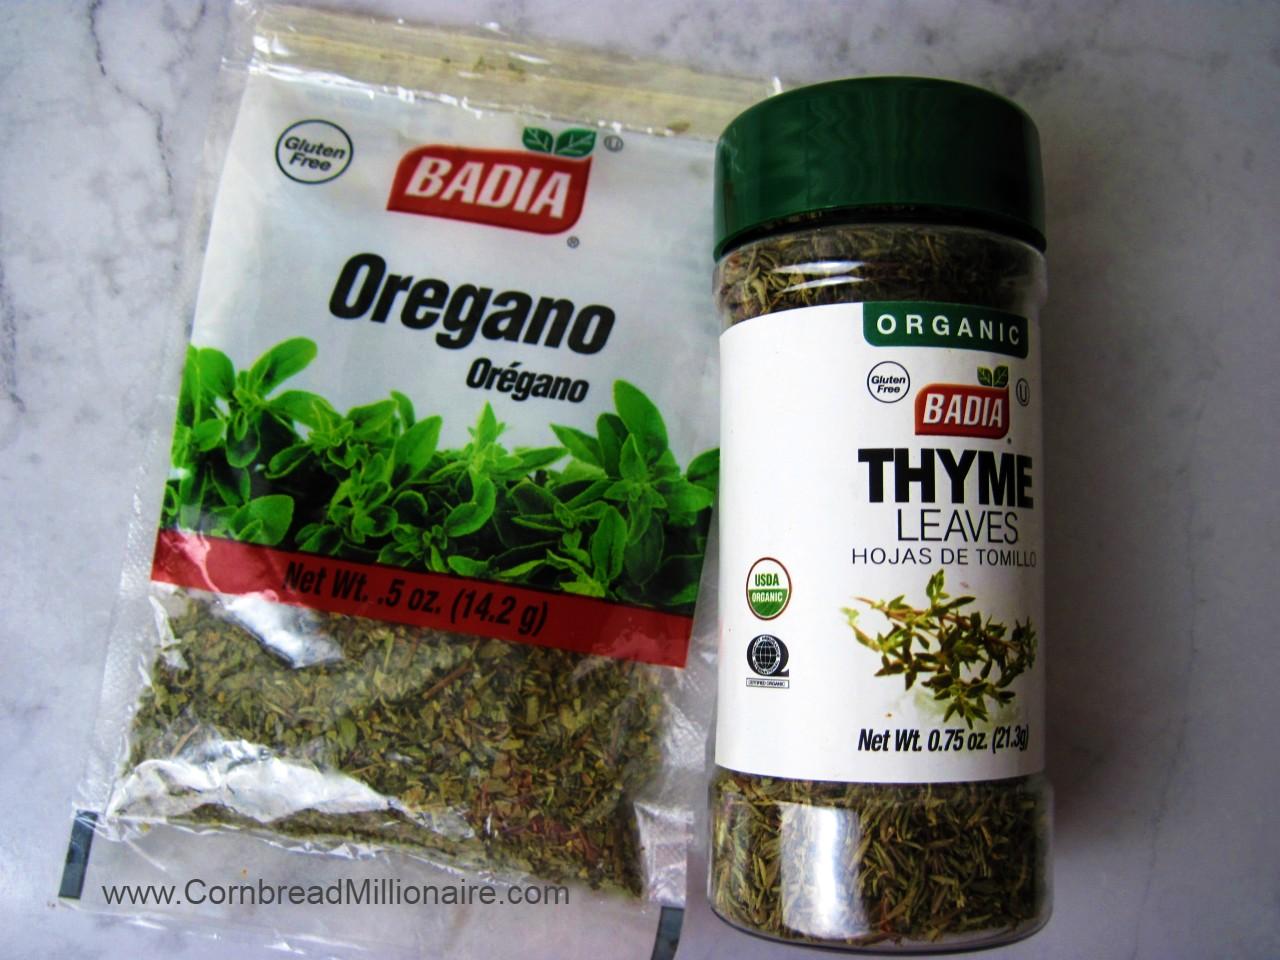 Oregano and Thyme